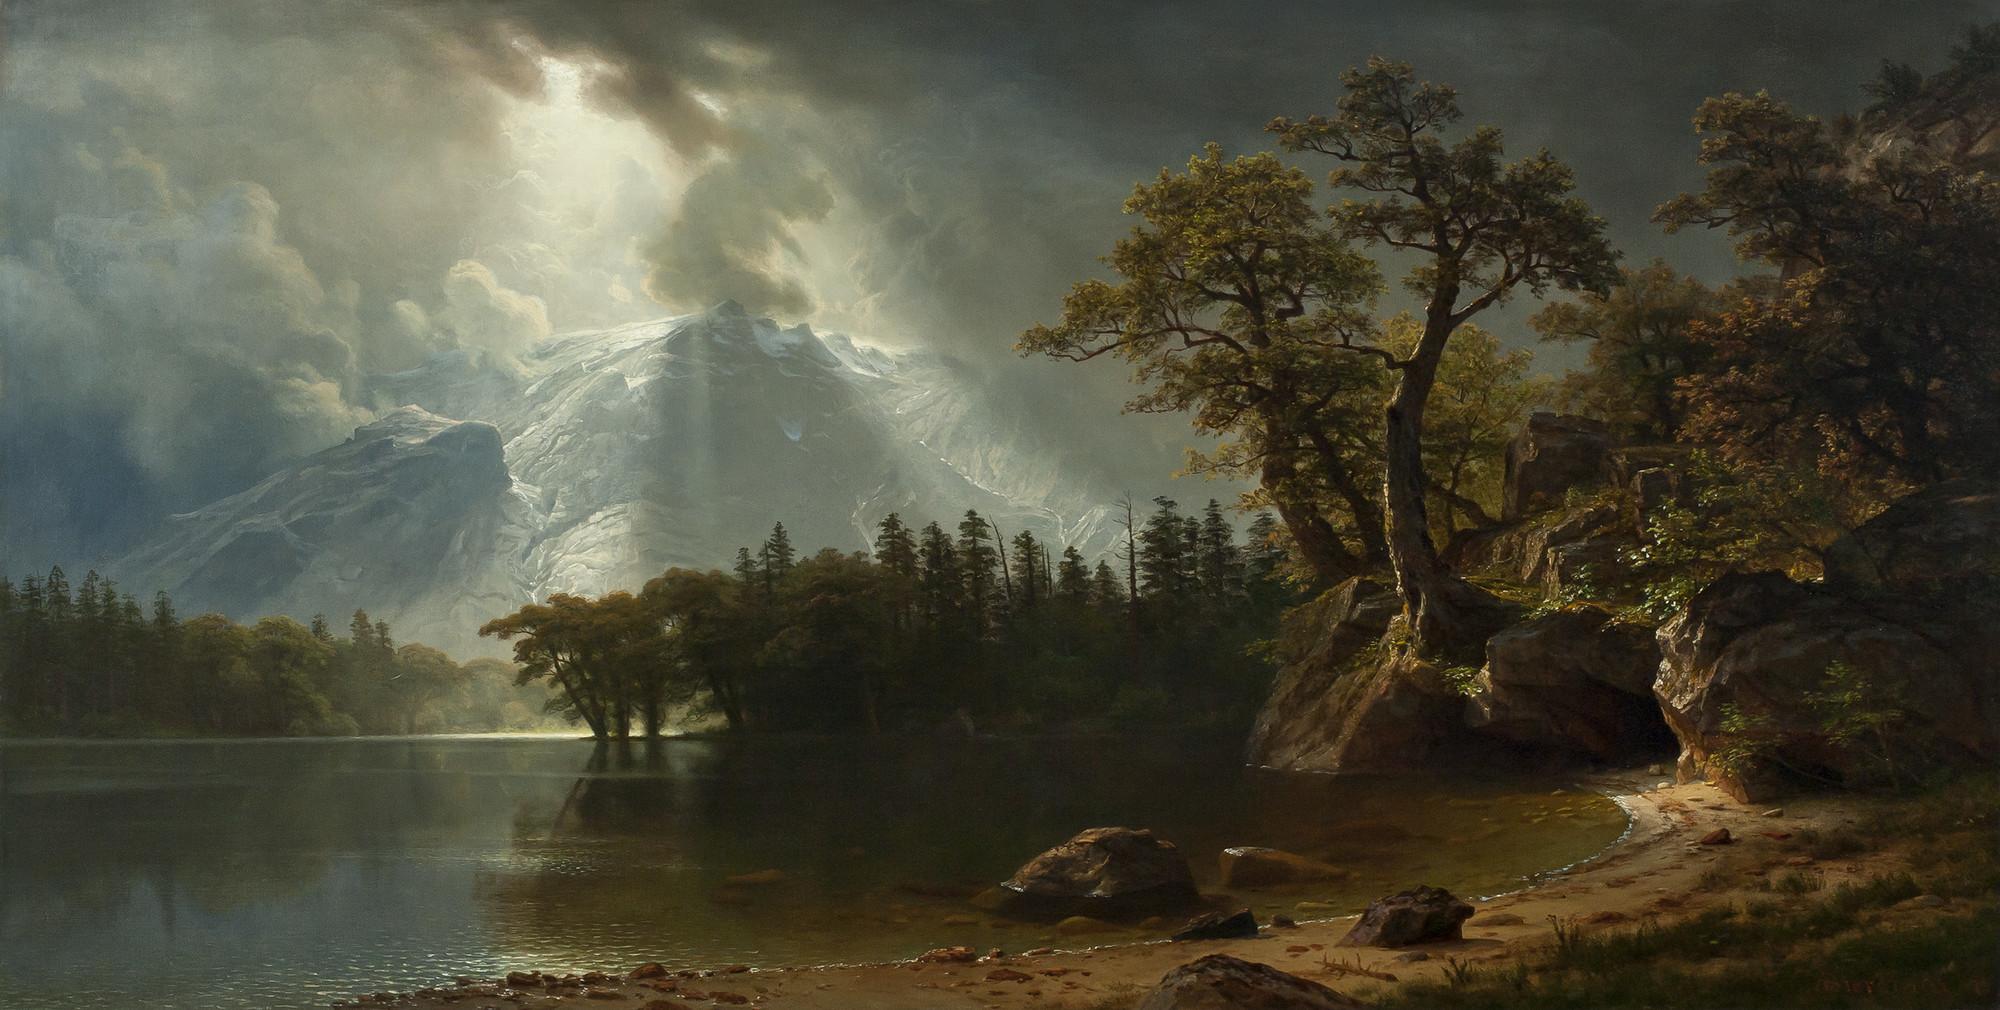 List of works by Albert Bierstadt